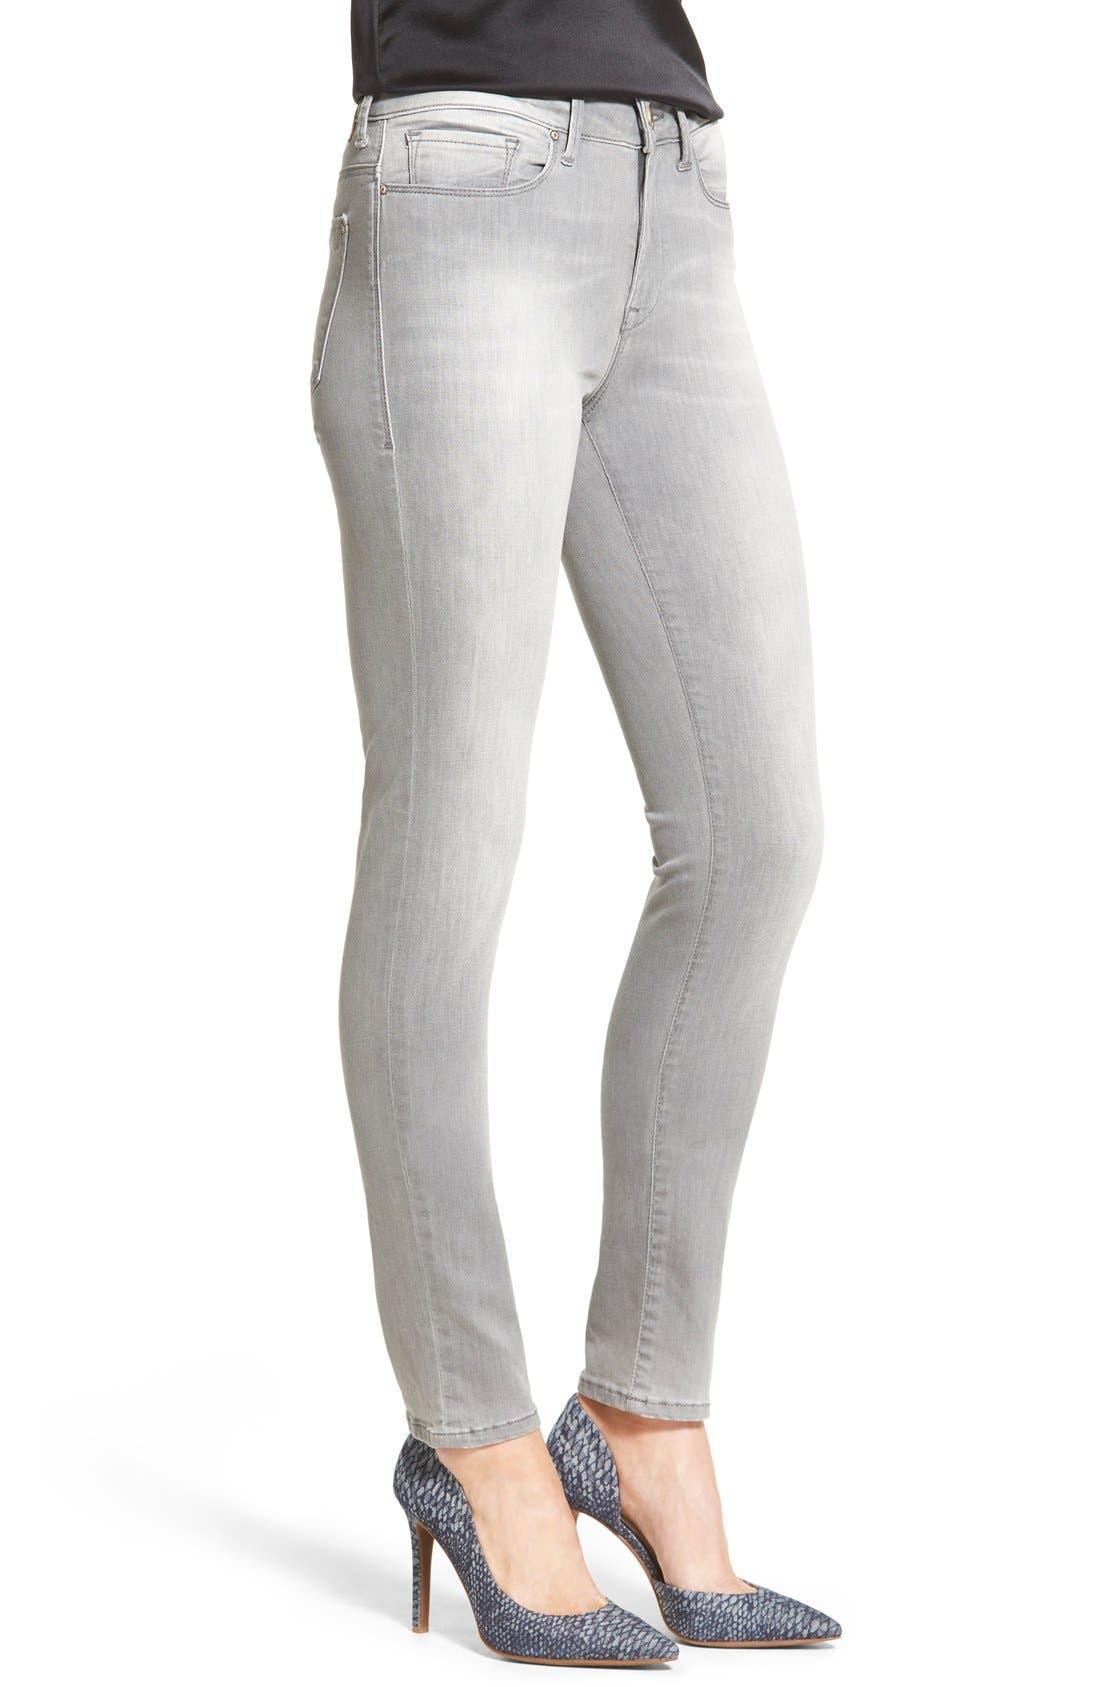 'Alissa' Stretch Skinny Jeans,                             Alternate thumbnail 3, color,                             Alissa Light Grey Tribeca